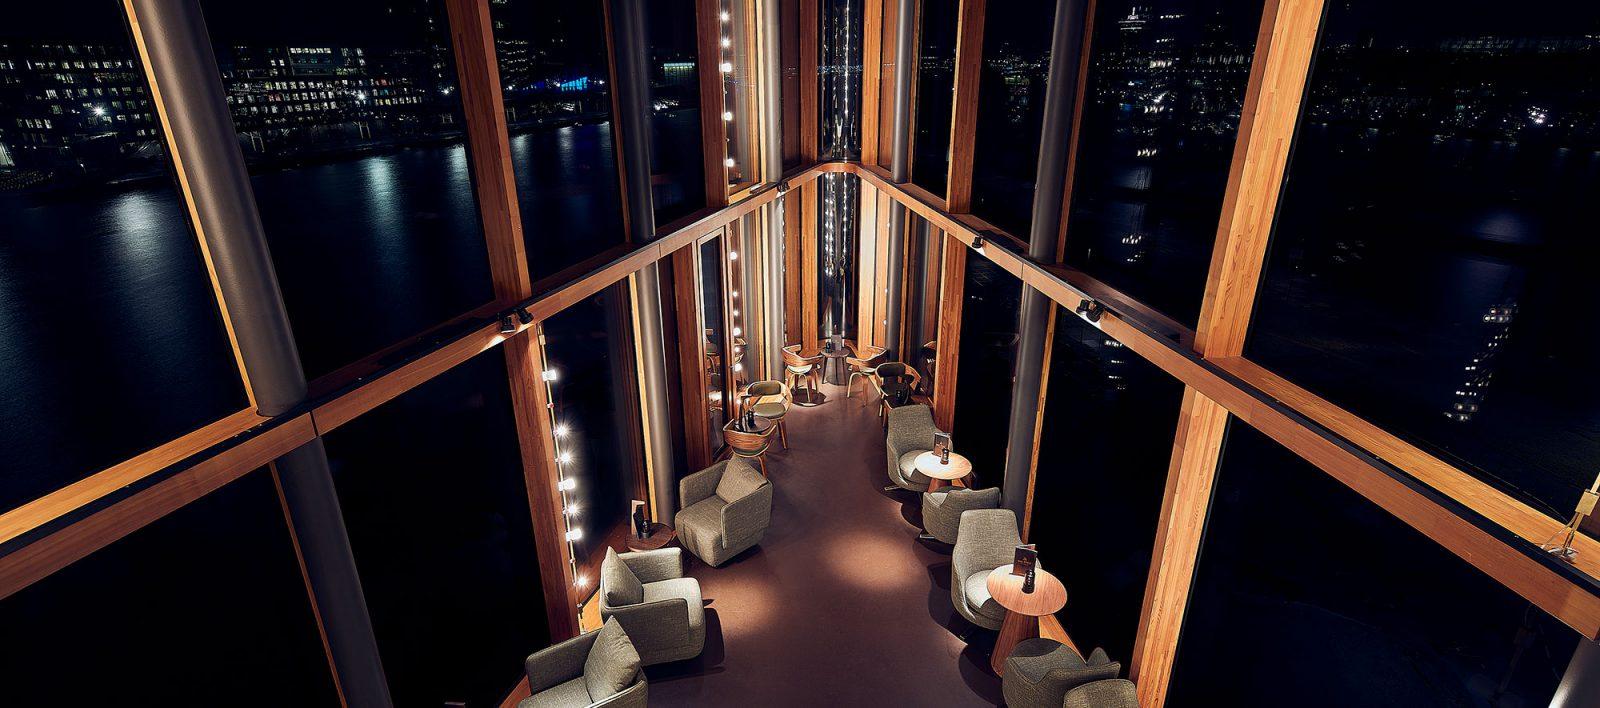 ROEF Rooftop Festival Amsterdam Hotel Jakarta